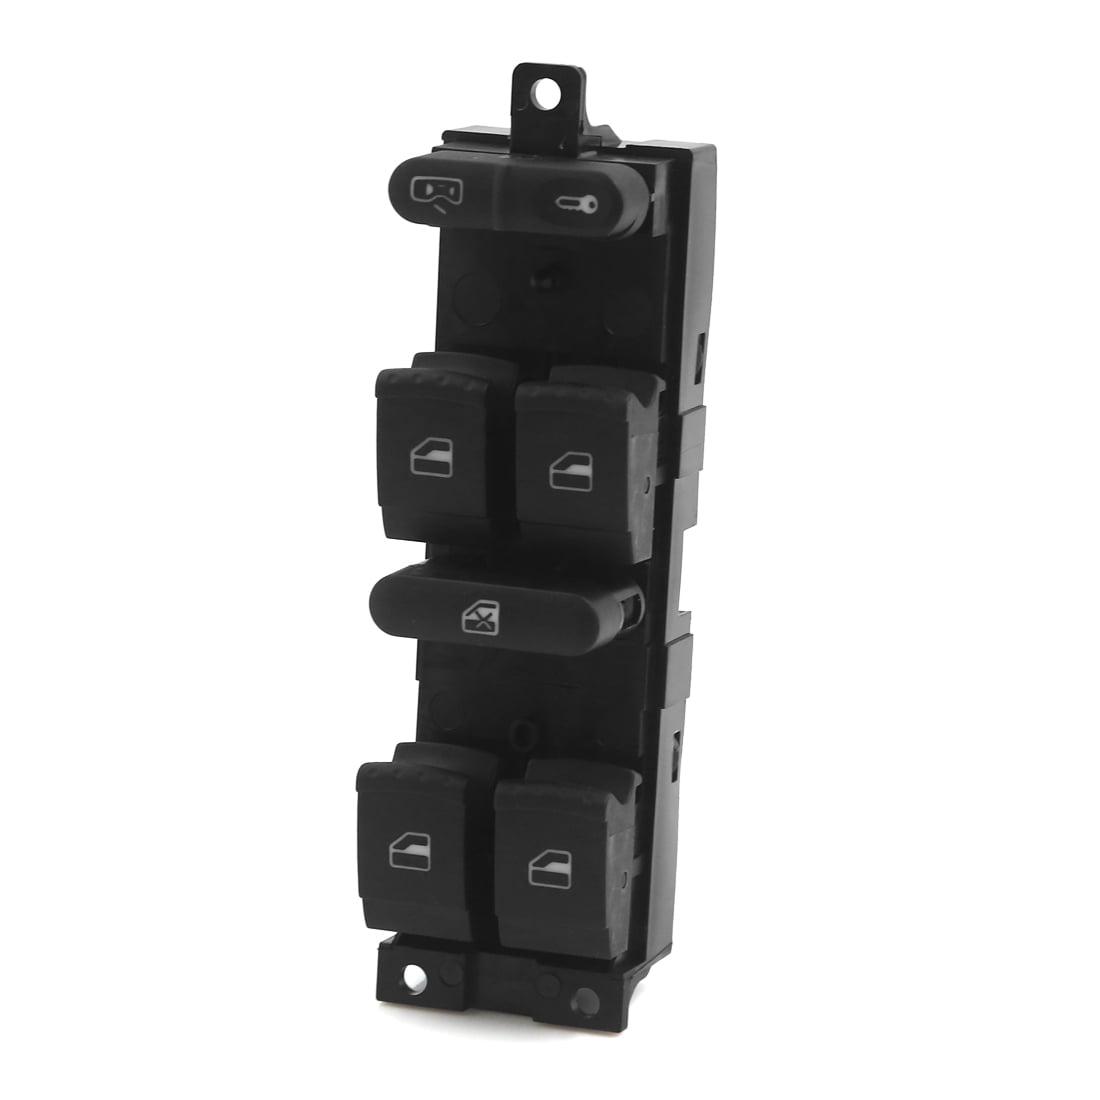 Driver Side Power Window Switch for 98-05 VW Golf Jetta Passat B5 1J4 959 857 D